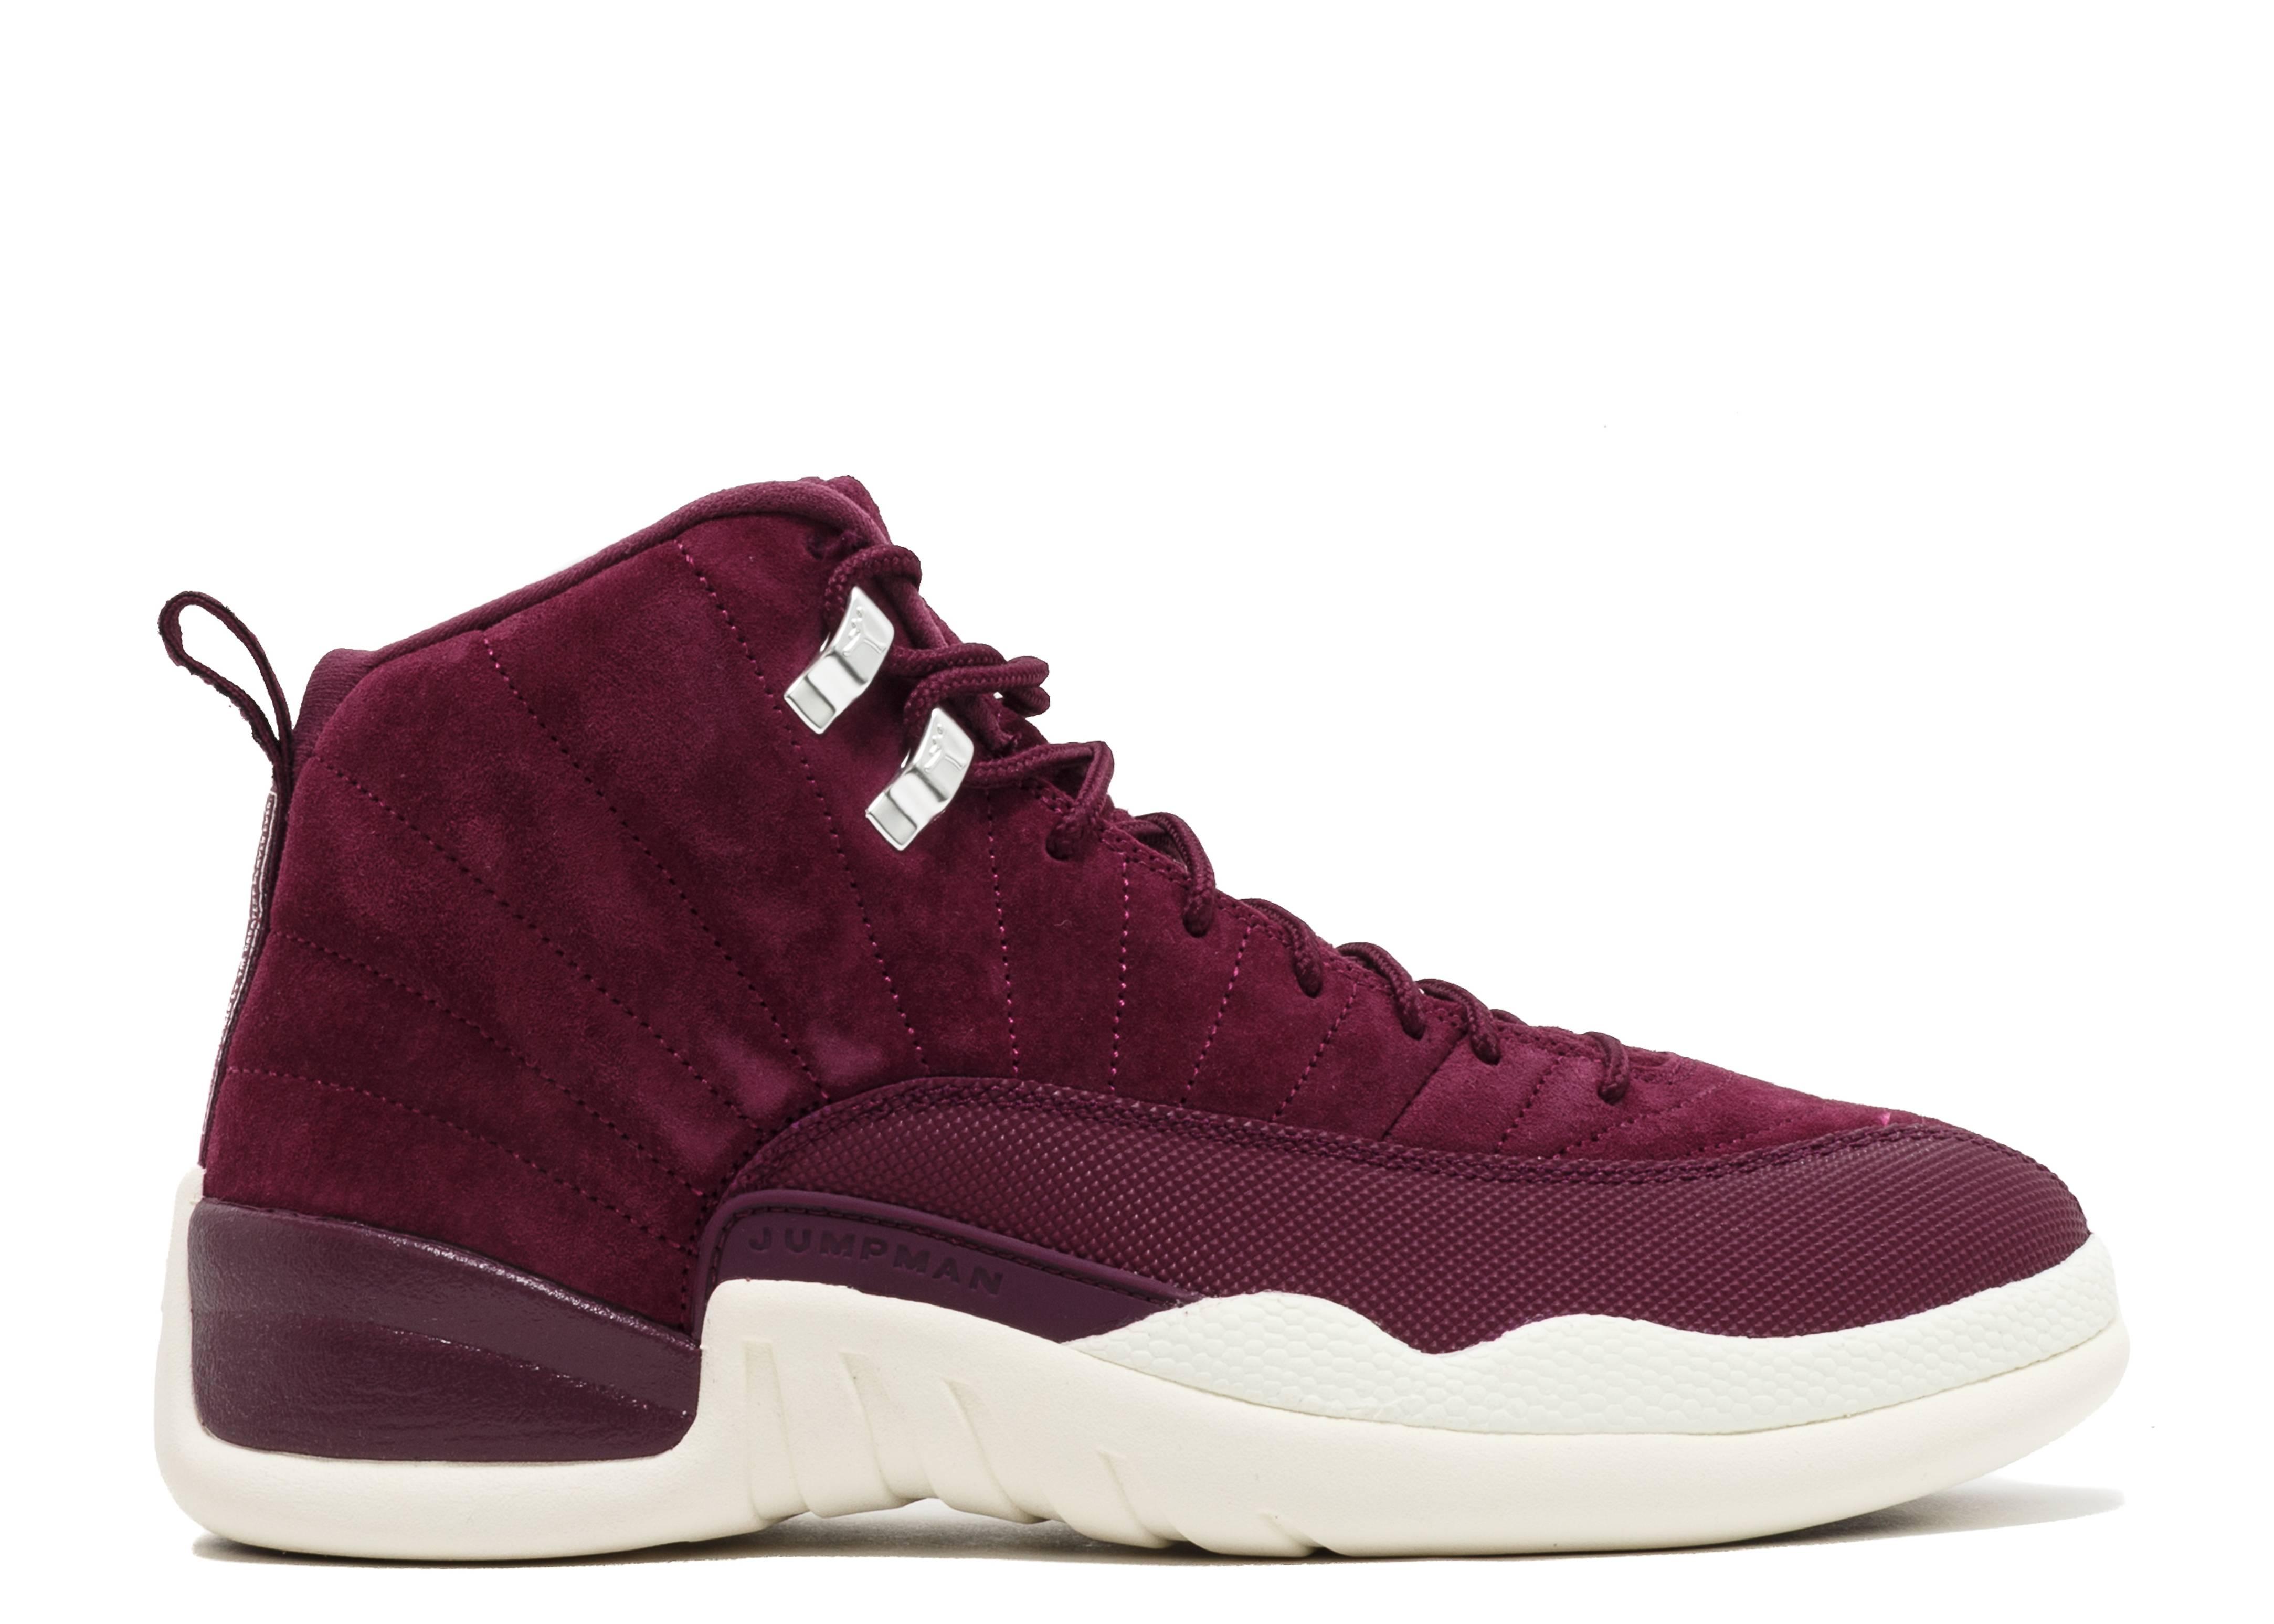 purple white mens air jordan retro 12 shoes On the 12 shoes